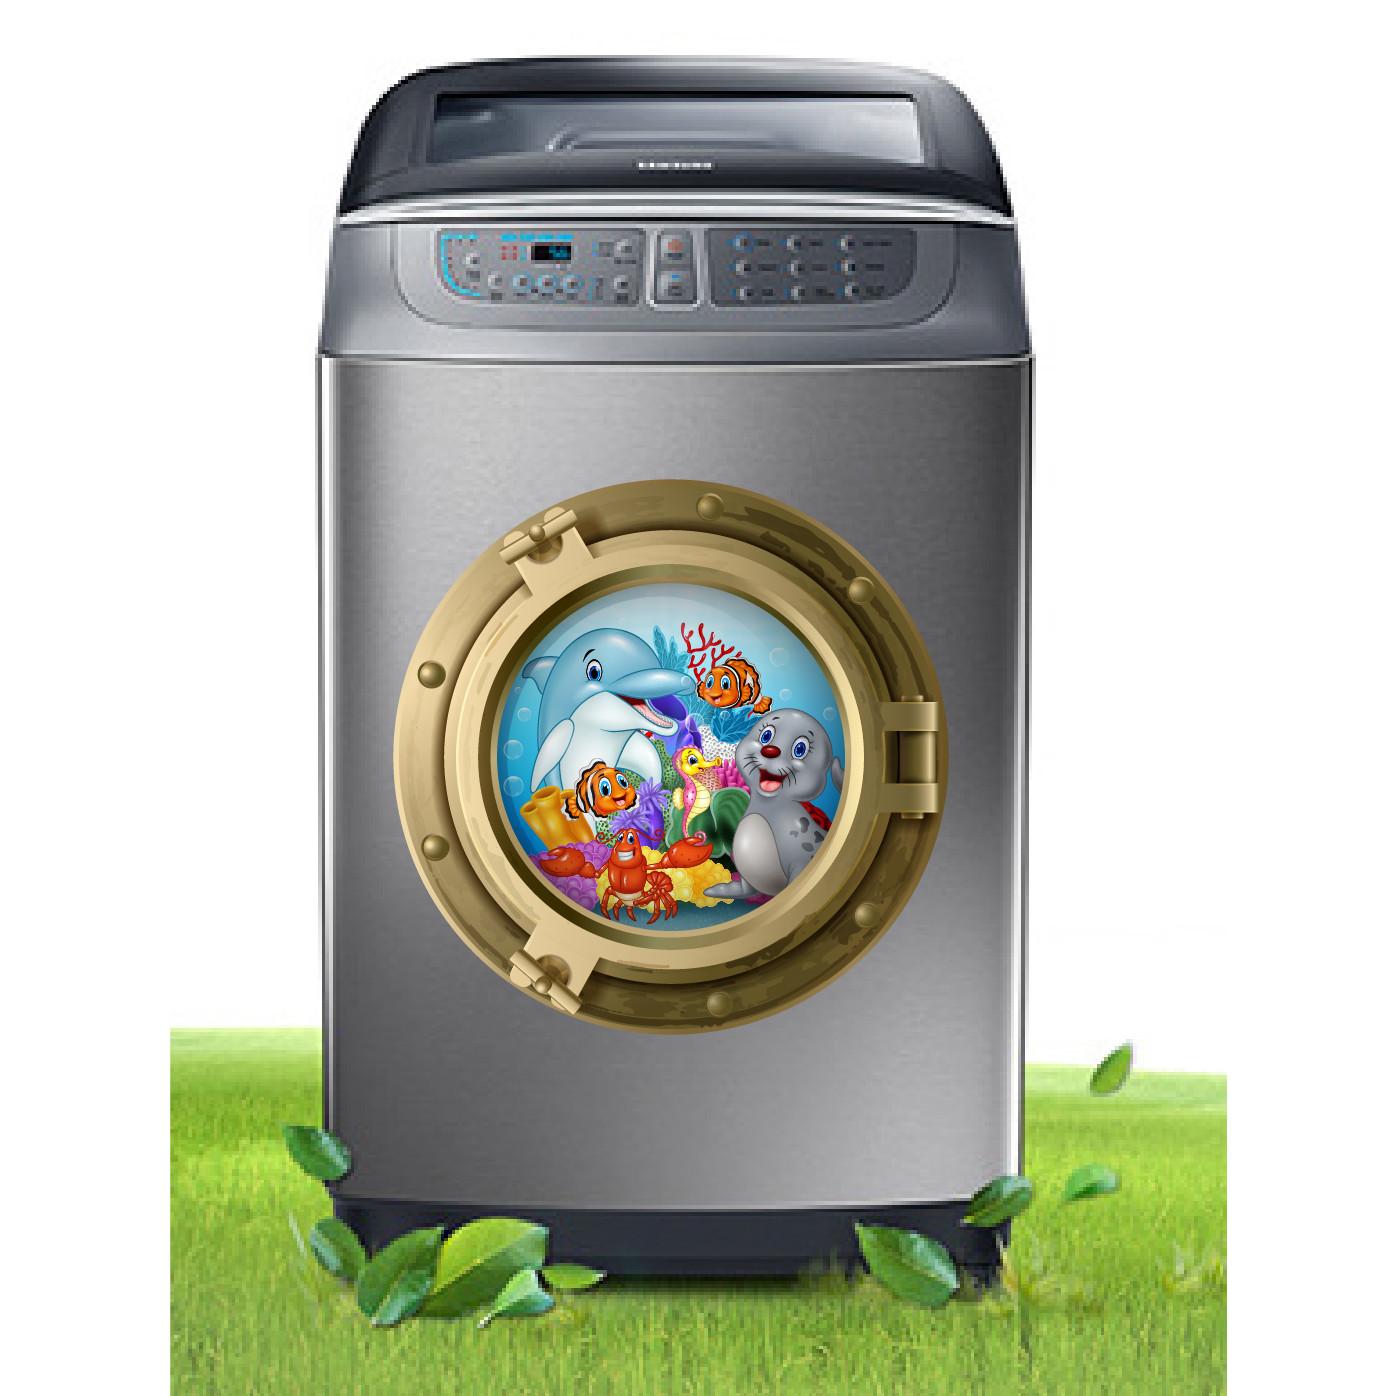 Decal trang trí máy giặt số 4